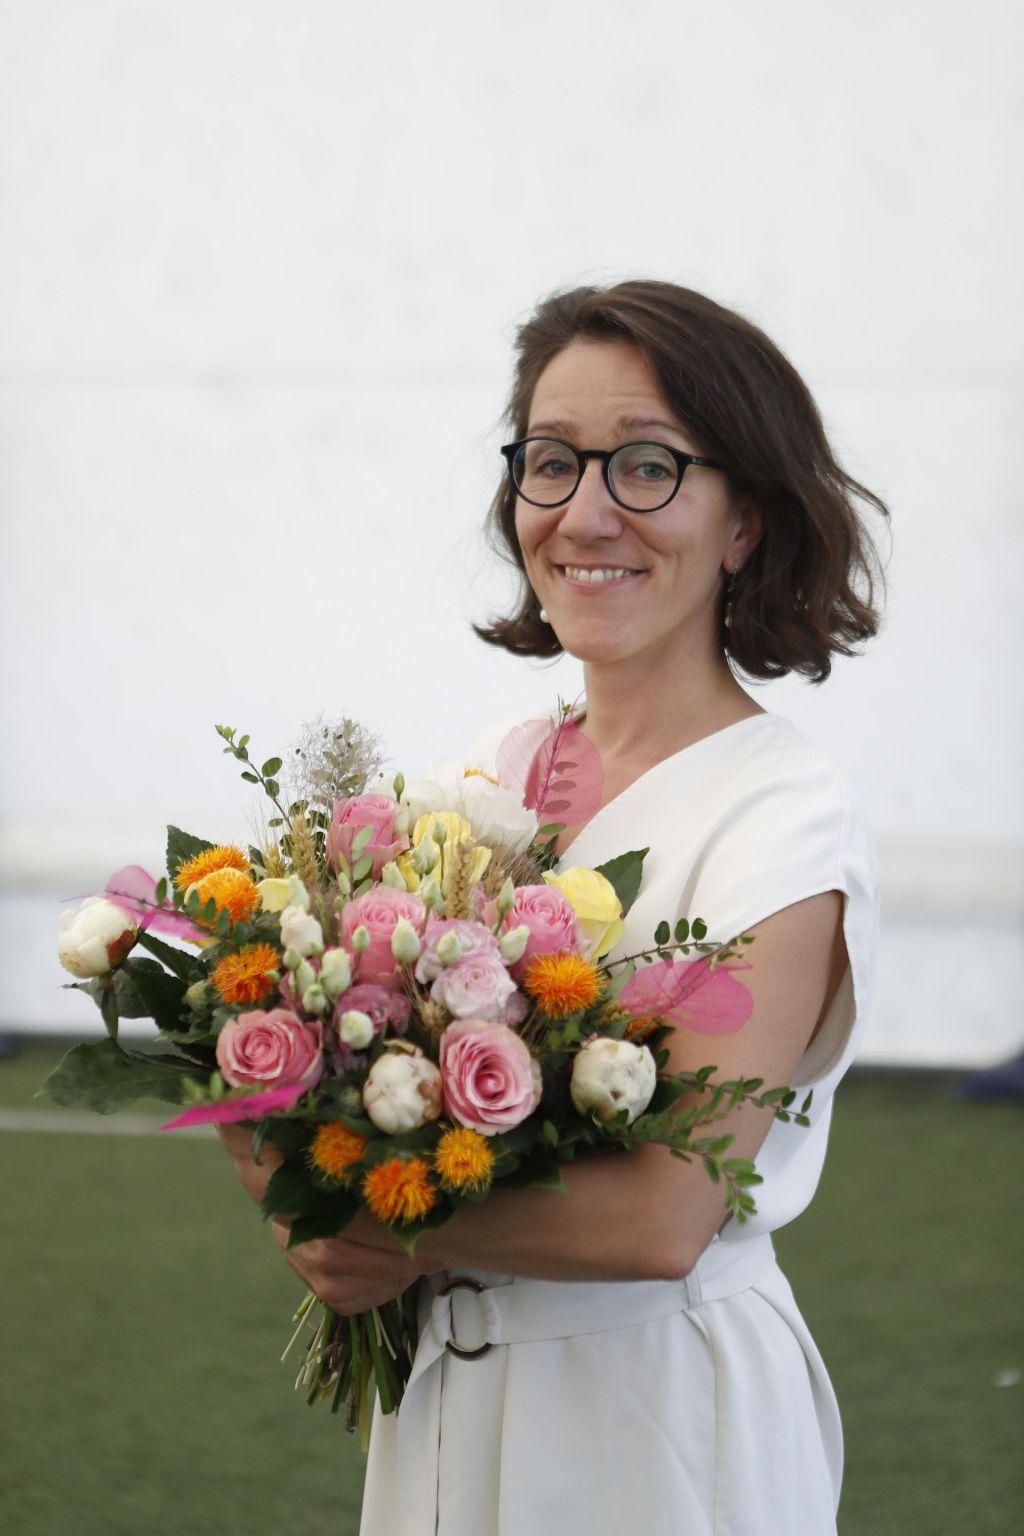 Najučiteljica je Tanja Jankovič